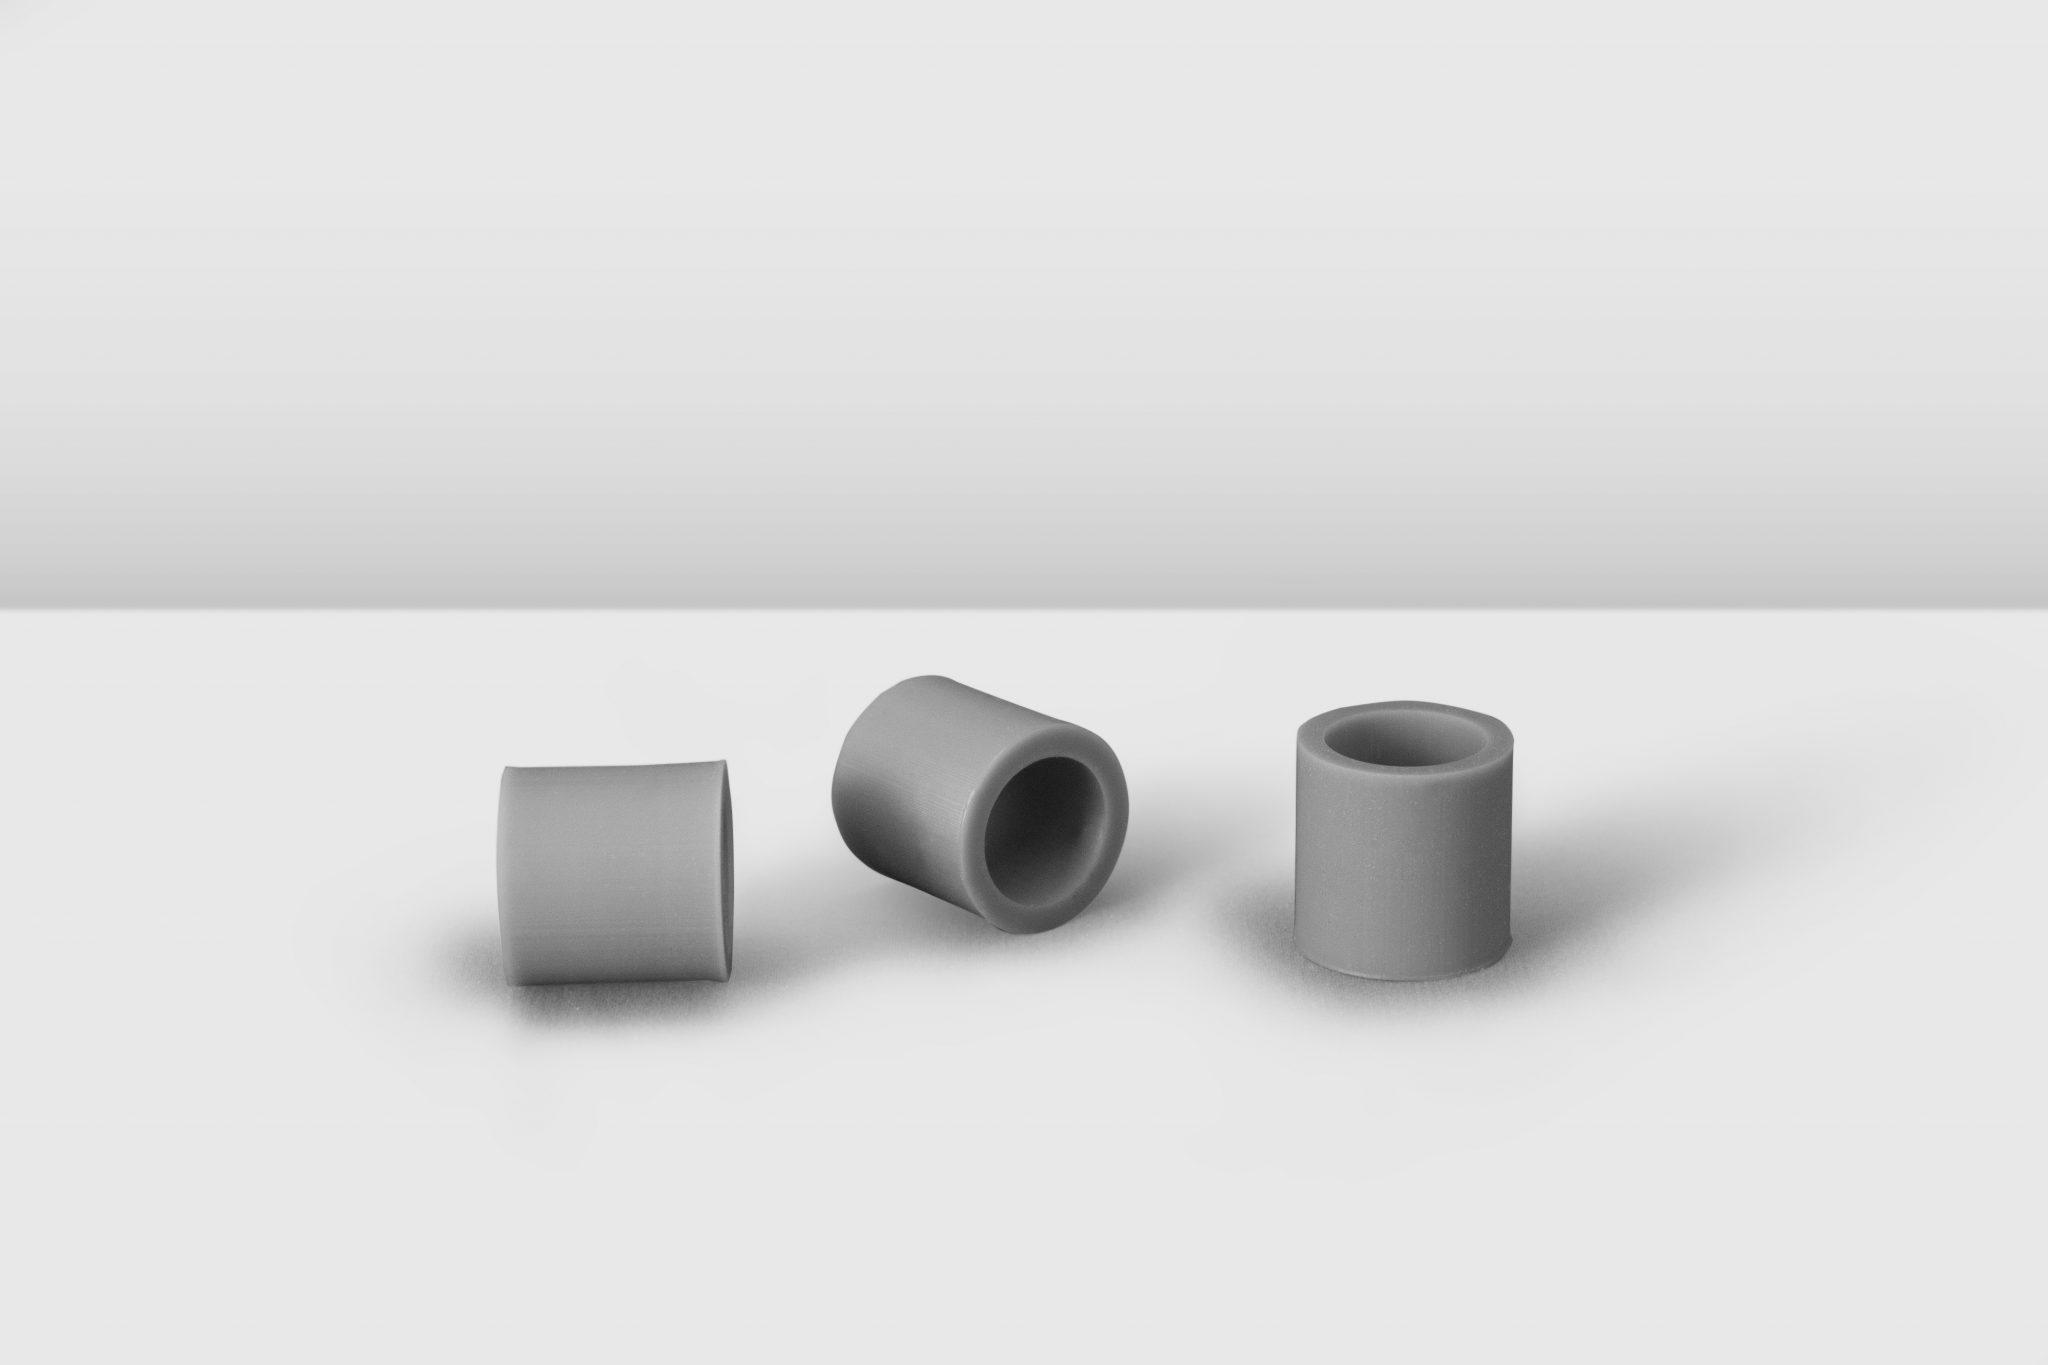 Column 3D print tests.